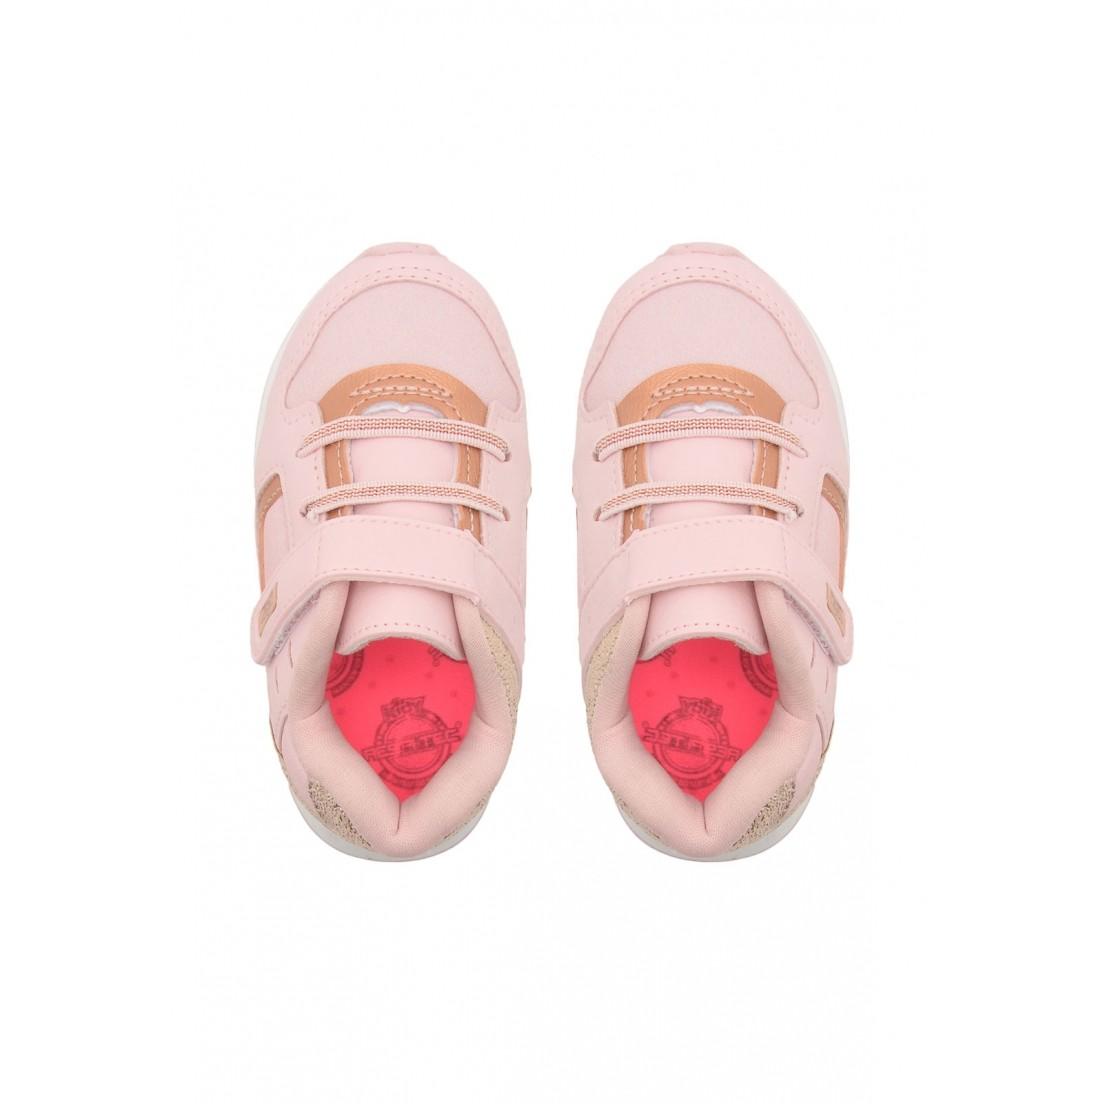 Tenis Kidy Rosa/Ouro Feminino 096-1121